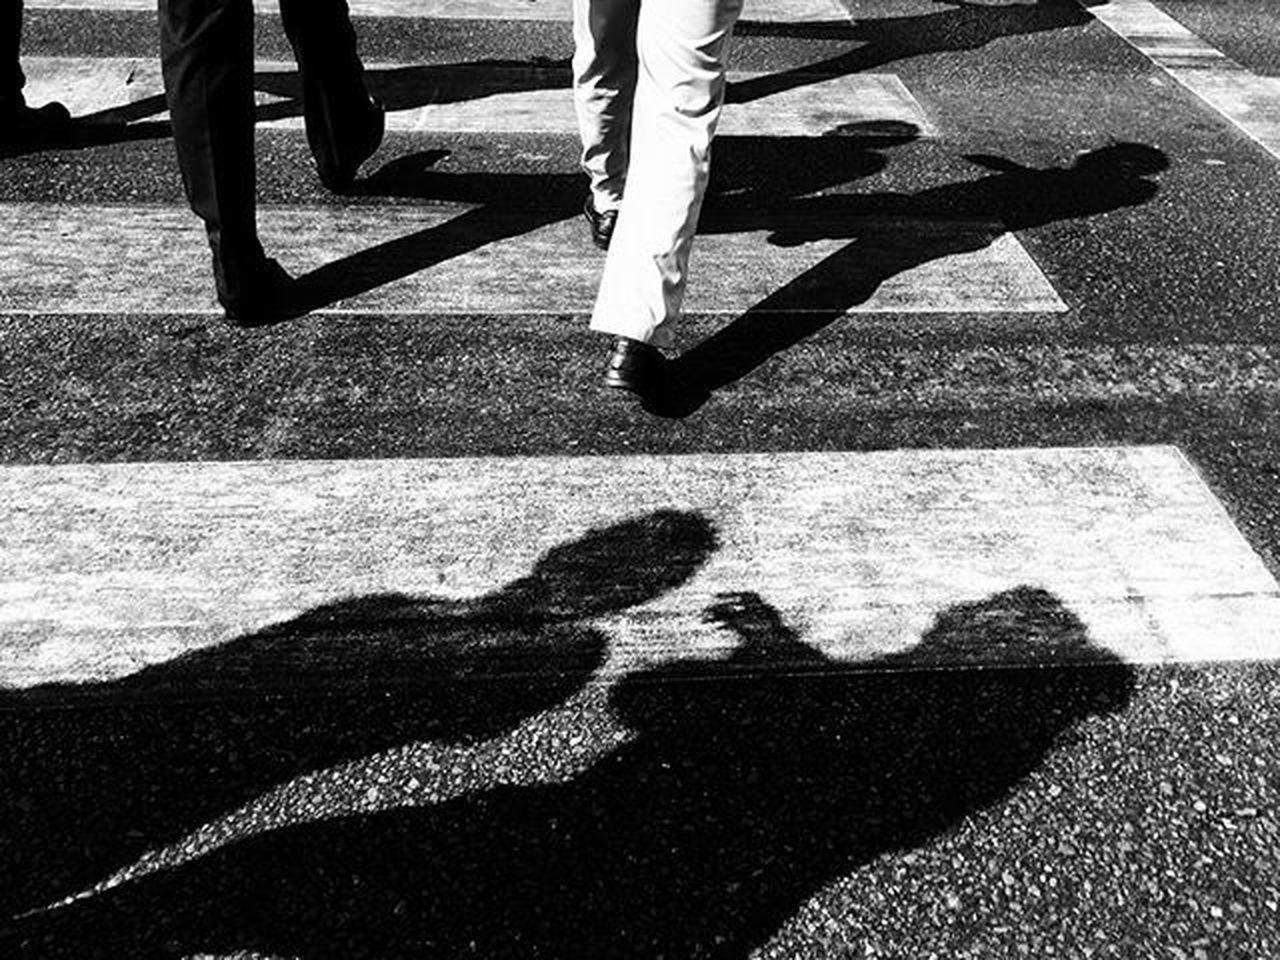 Blackandwhite Bnw Bnw_captures Shadowhunter Shadows Ig_bnw Igersdubai Igers Dubaistreet Snapseed Snapshot Ig_street Igers Streetshot Stockphoto Streetphoto_bw Bnw_life_shots Daandxb @litratistasadaan @in_public_street_photo @streetphotographyintheworld